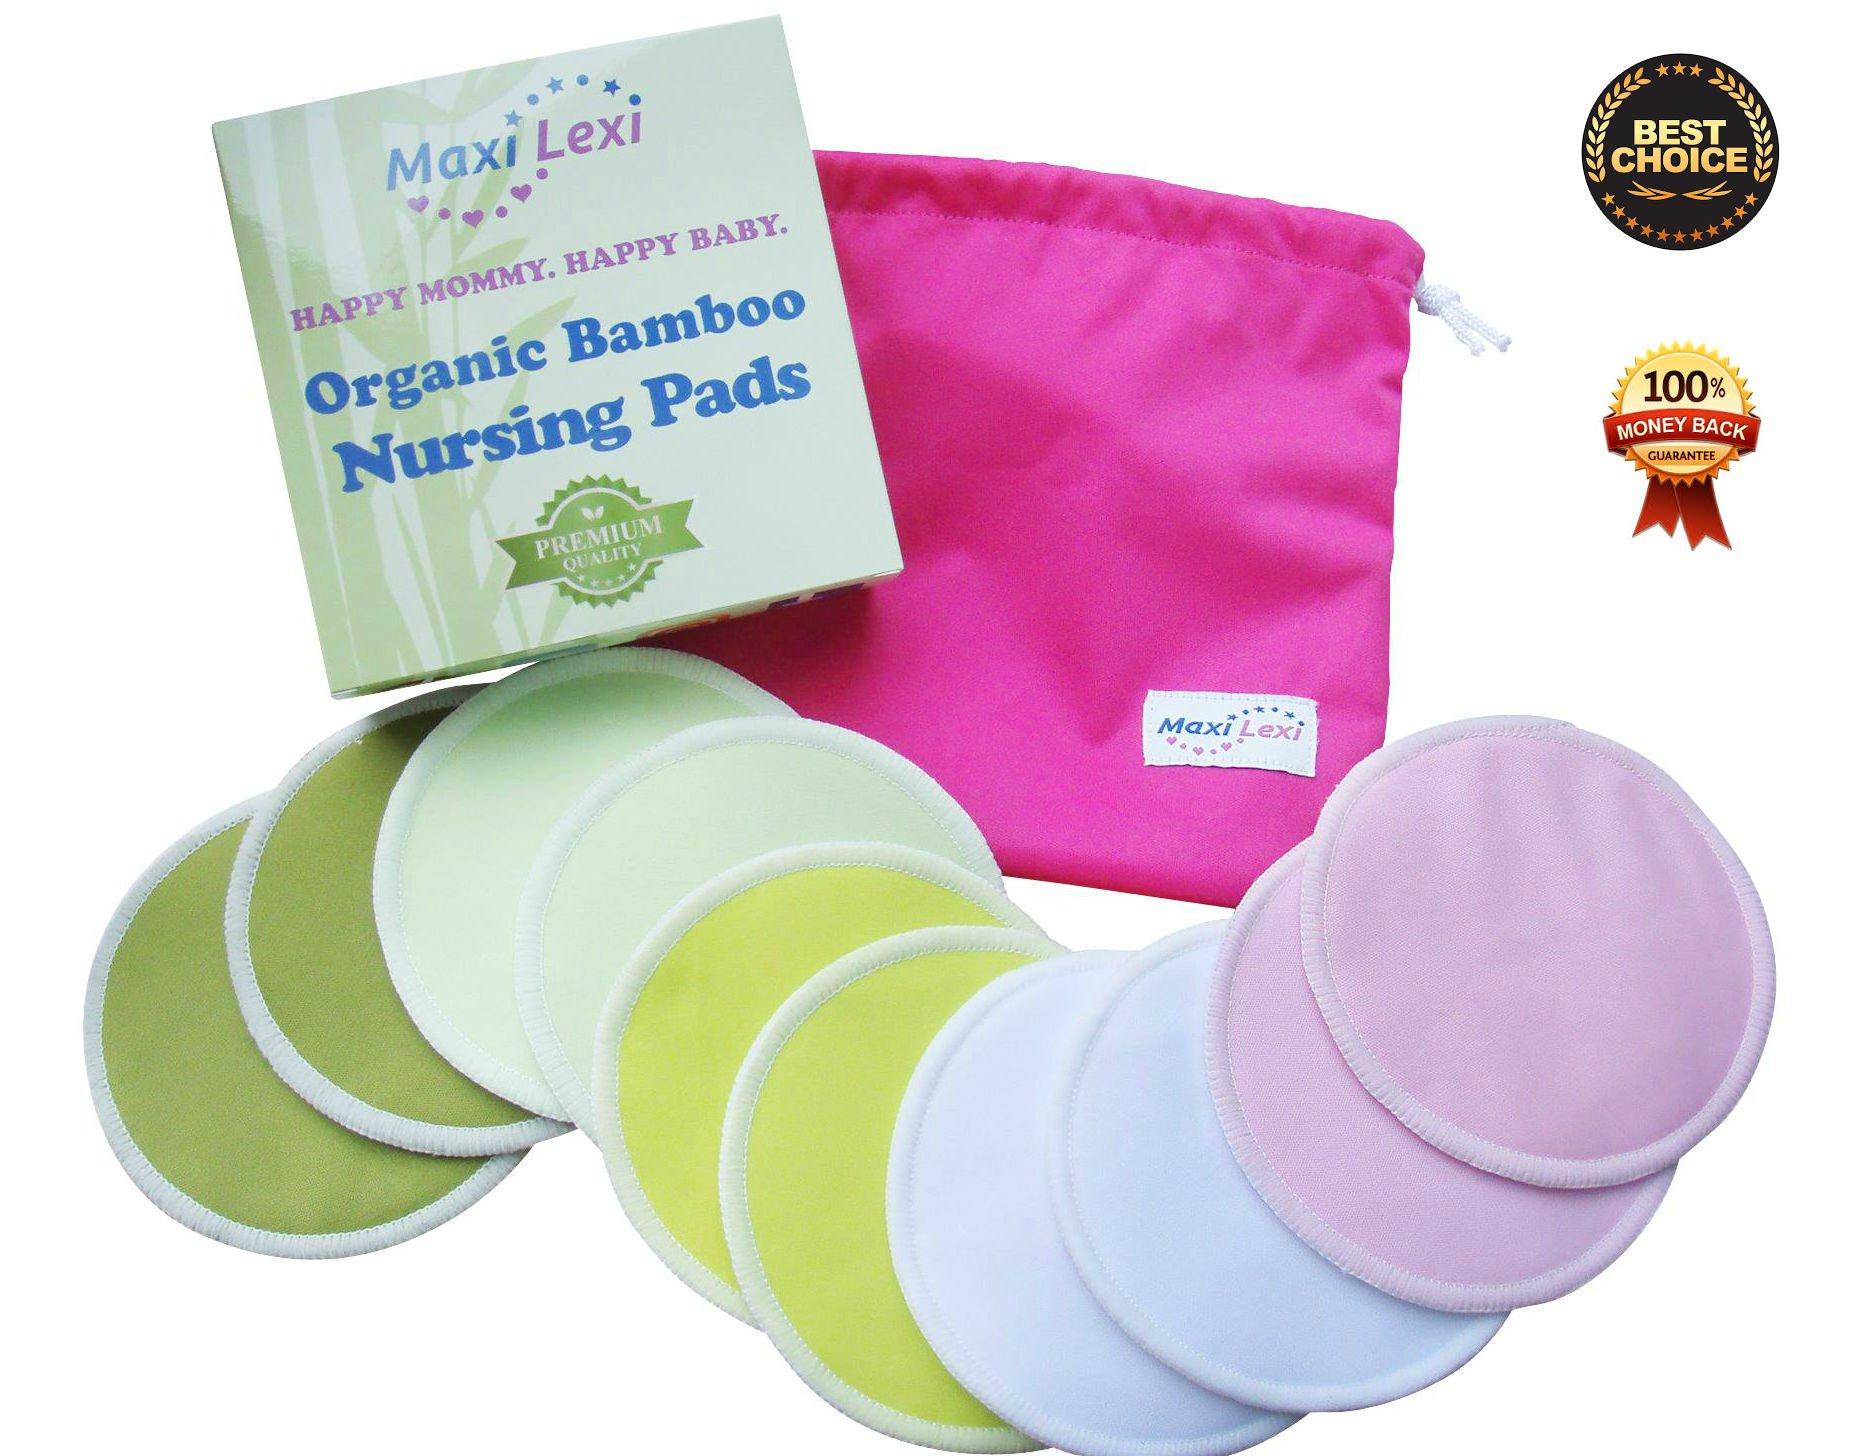 Organic Bamboo Nursing Pads (10 Pack) Bonus Laundry + Travel Bag, Reusable & Washable, Nursing & Milk Bra Pads Made Of Organic, Hypoallergenic, Absorbent & Leak Proof, Premium Soft Breastfeeding Pads